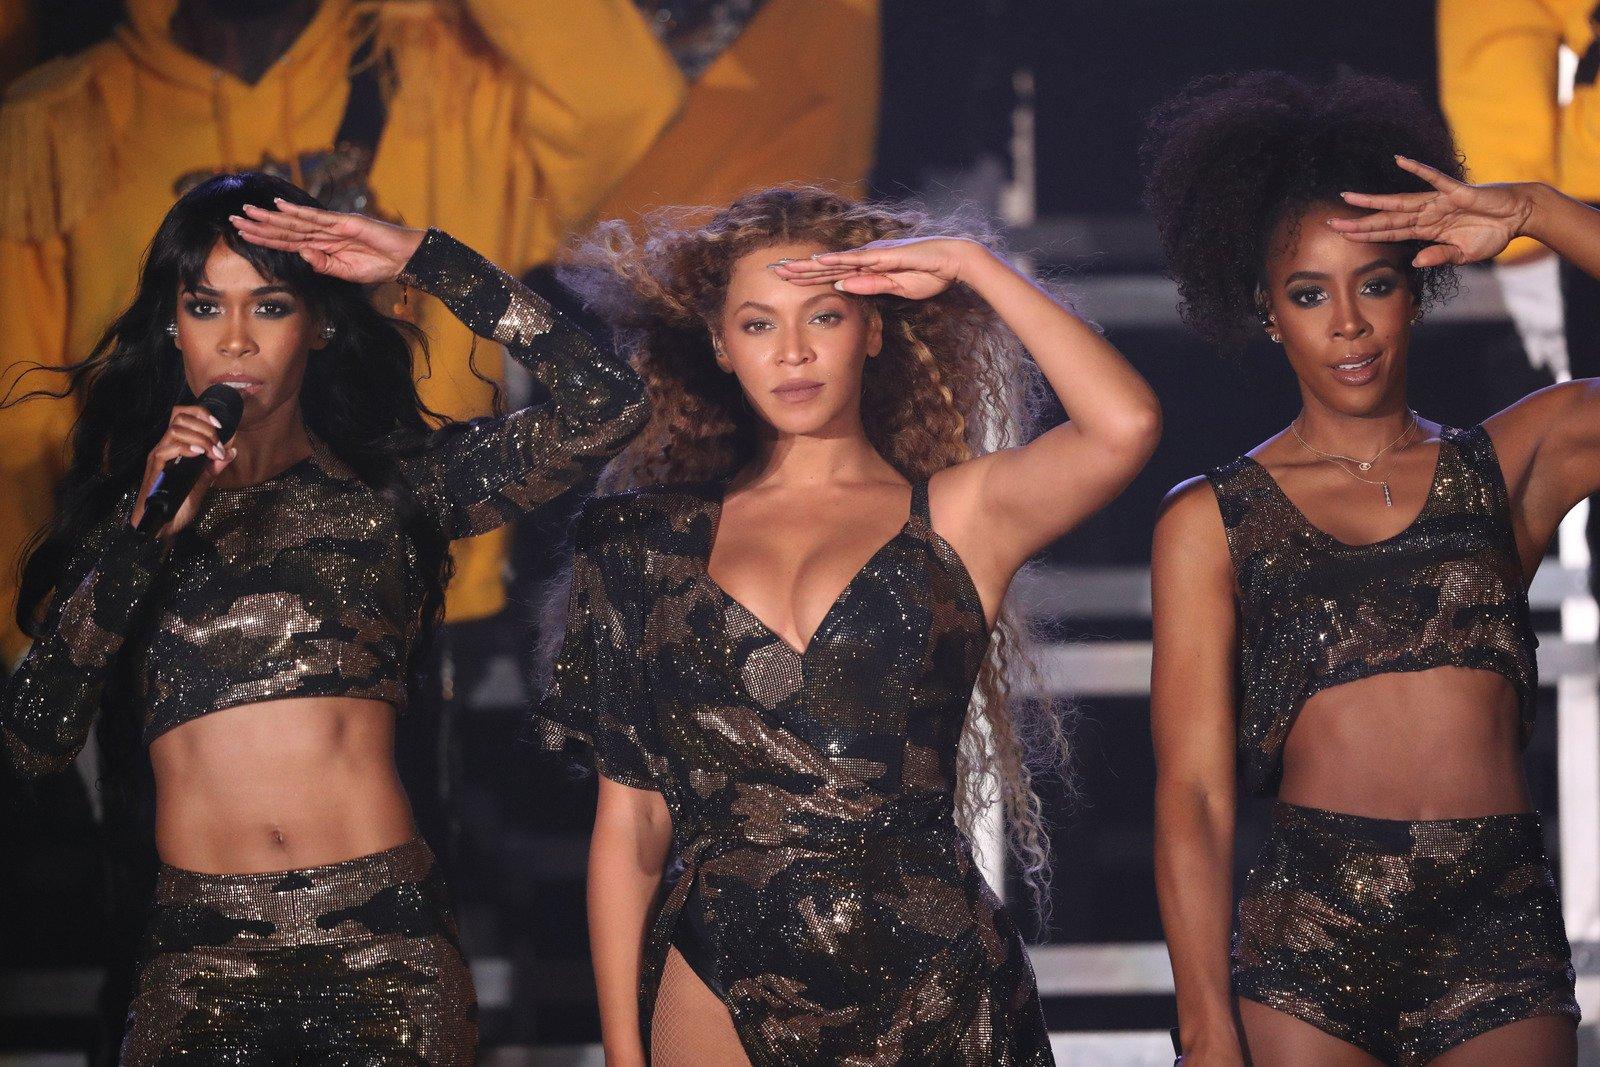 .@Beyonce just reunited with Destiny's Child at #Coachella. https://t.co/072a0U2geG https://t.co/2EQdvdZ0GO